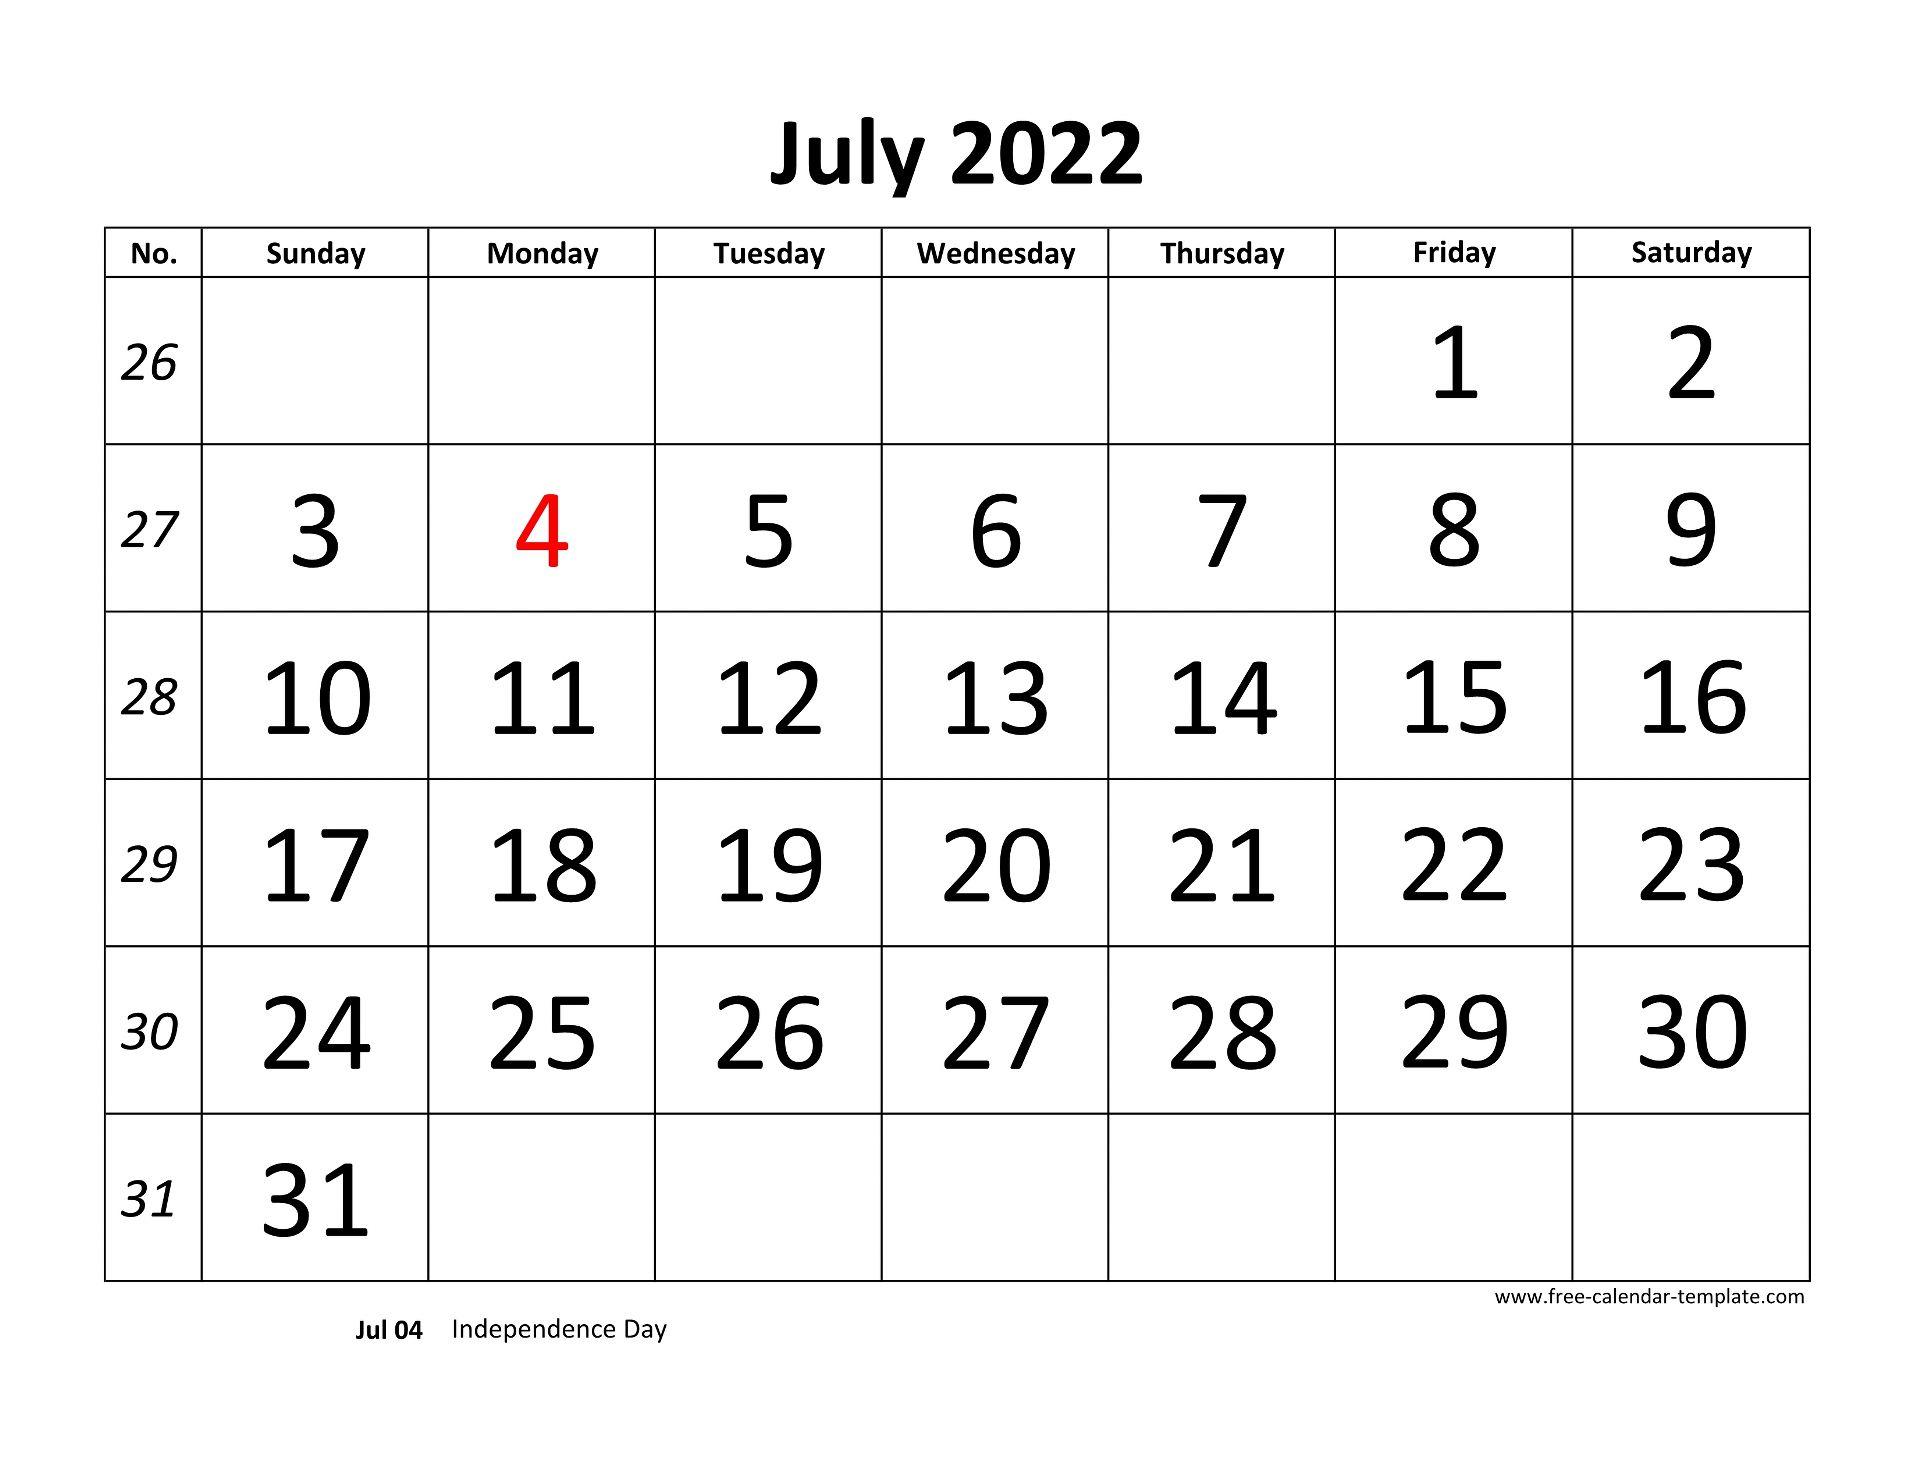 July 4 2022 Calendar.July 2022 Calendar Designed With Large Font Horizontal Free Calendar Template Com